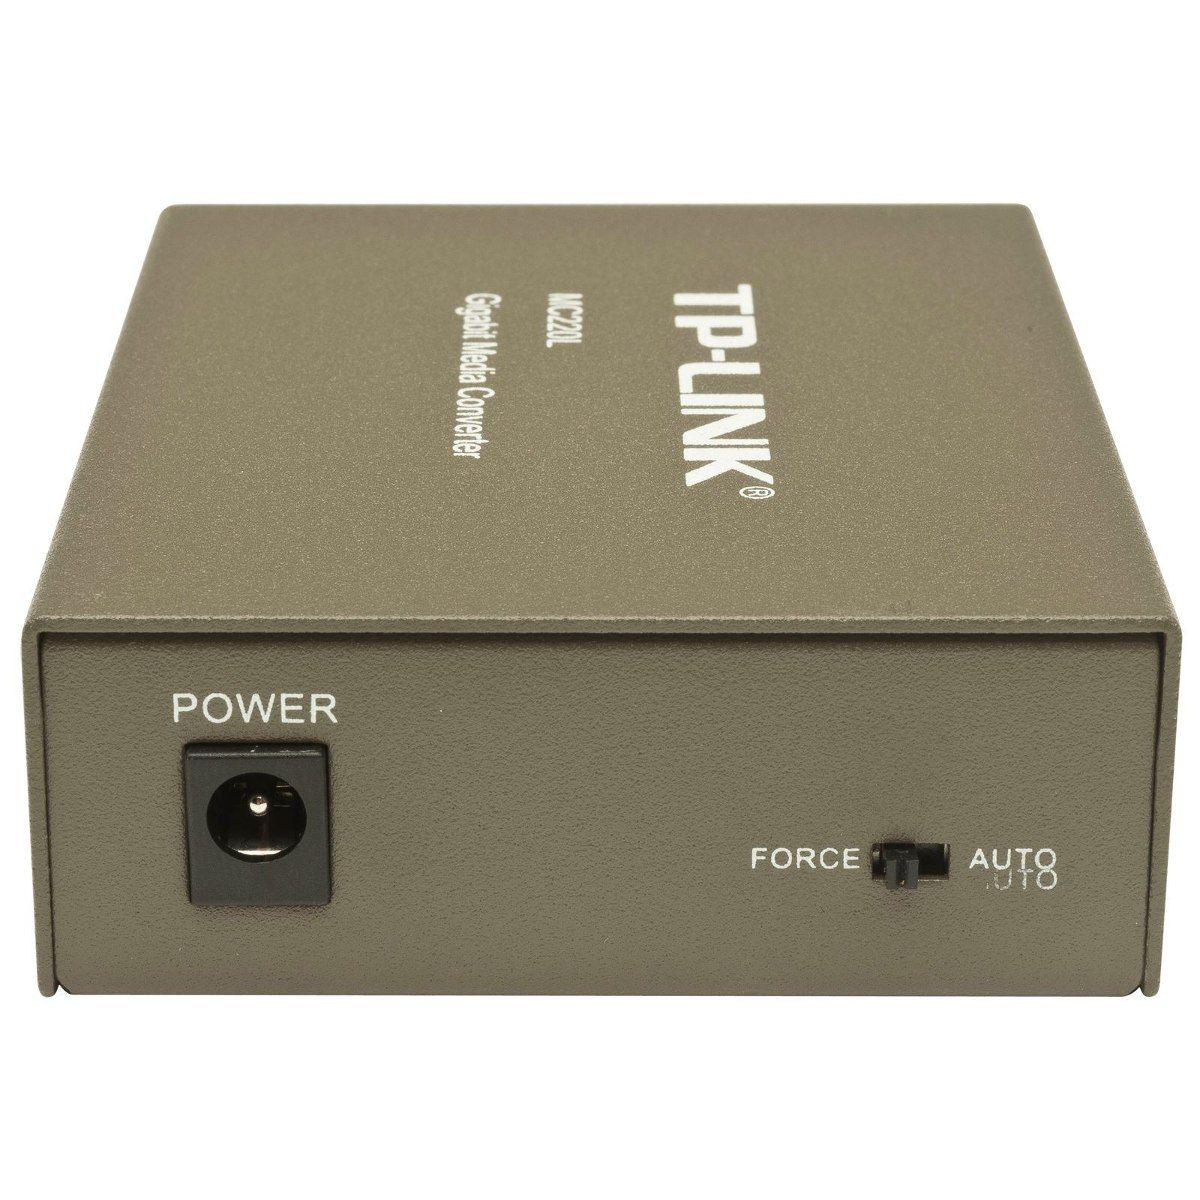 Conversor Rj45 Mídia Fibra Ótica Gigabit Sfp Tp-link Mc220l